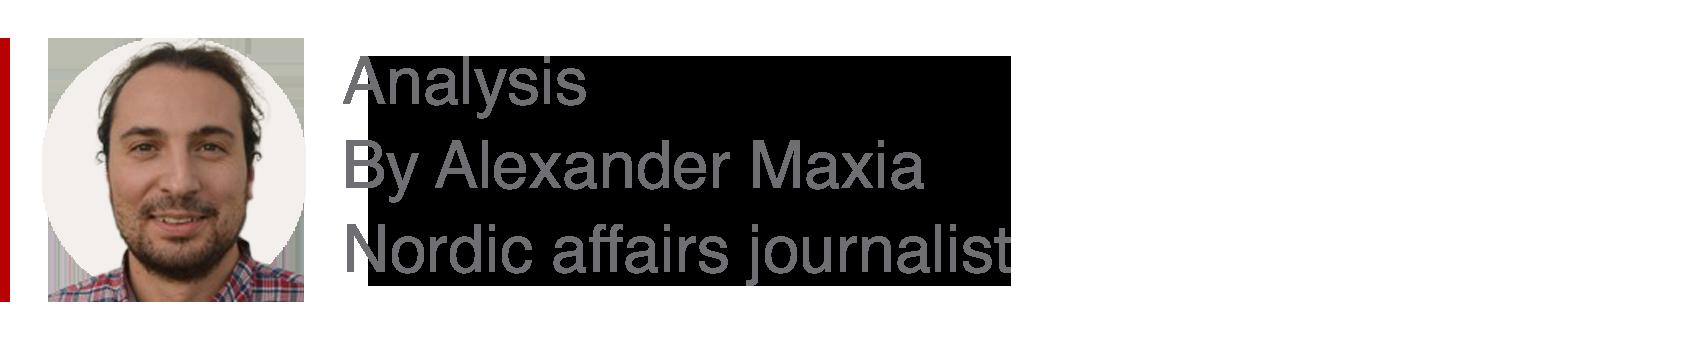 Alexander Maxia